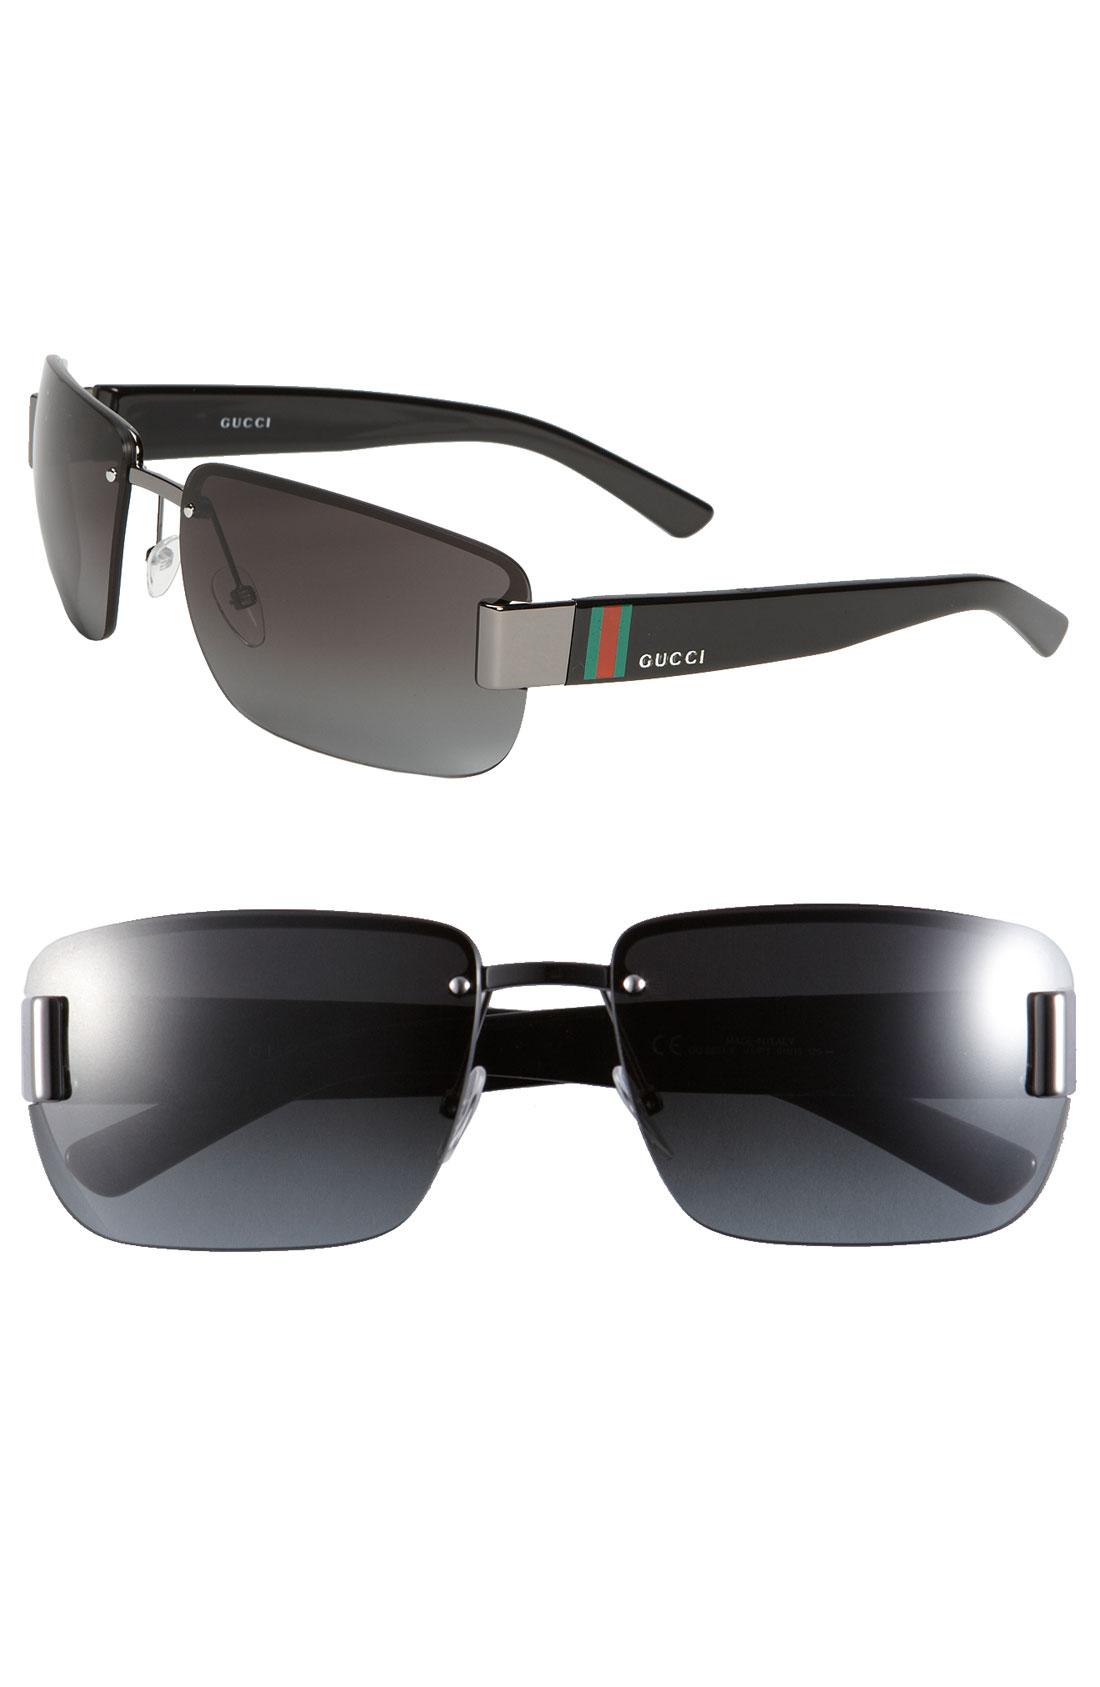 41d0983909e Top Mens Designer Sunglasses 2013